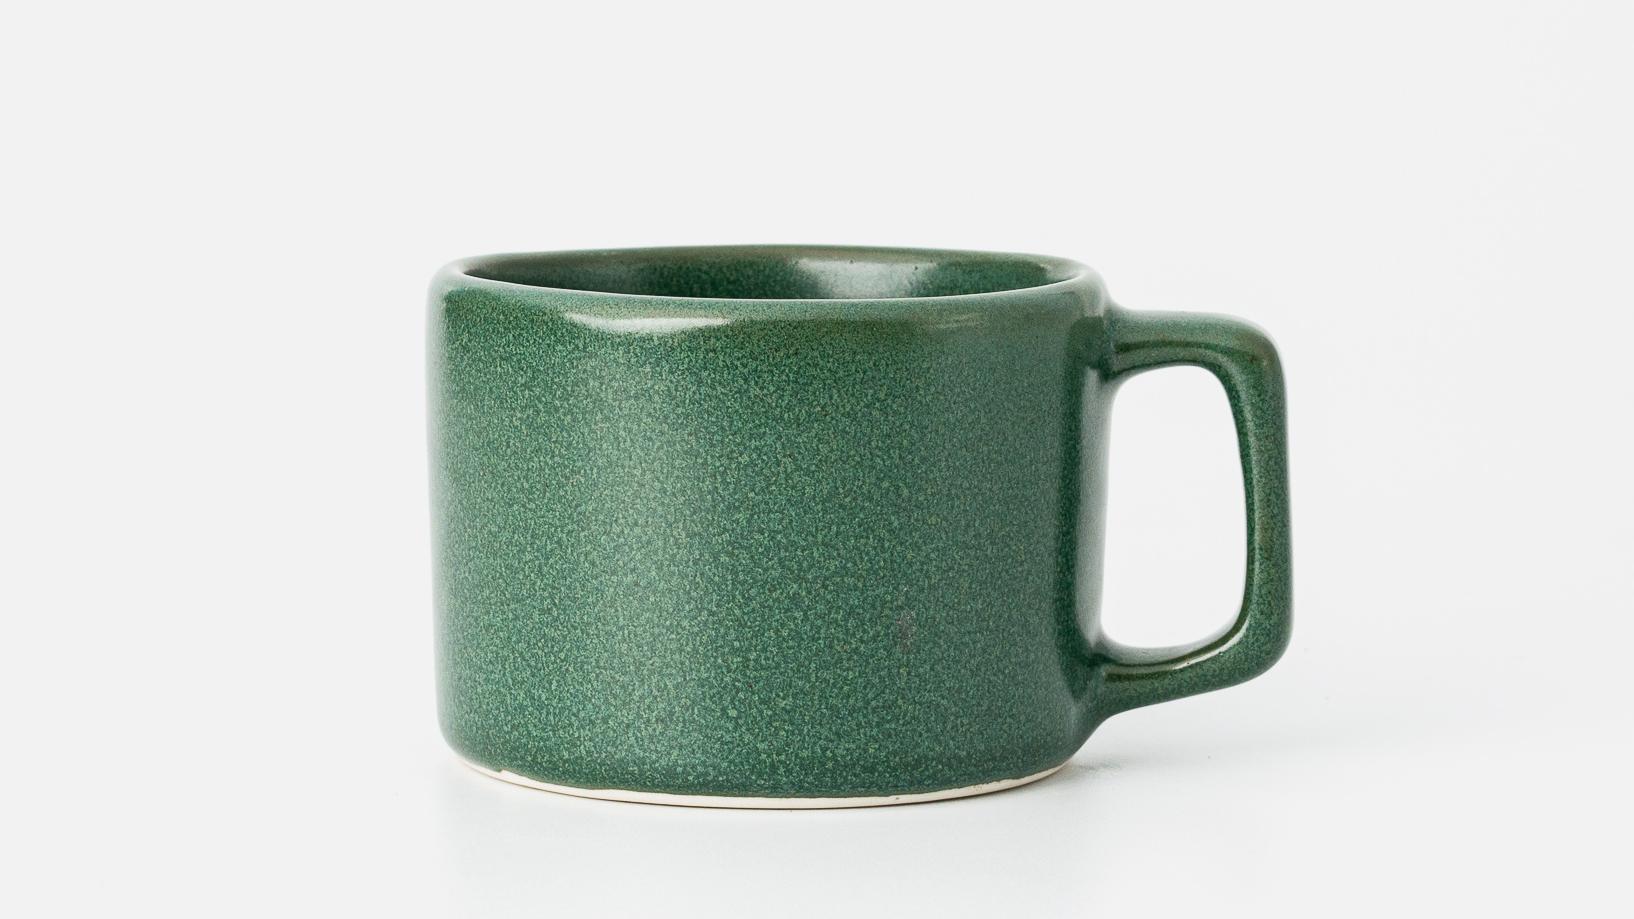 Haand 10 oz short mug